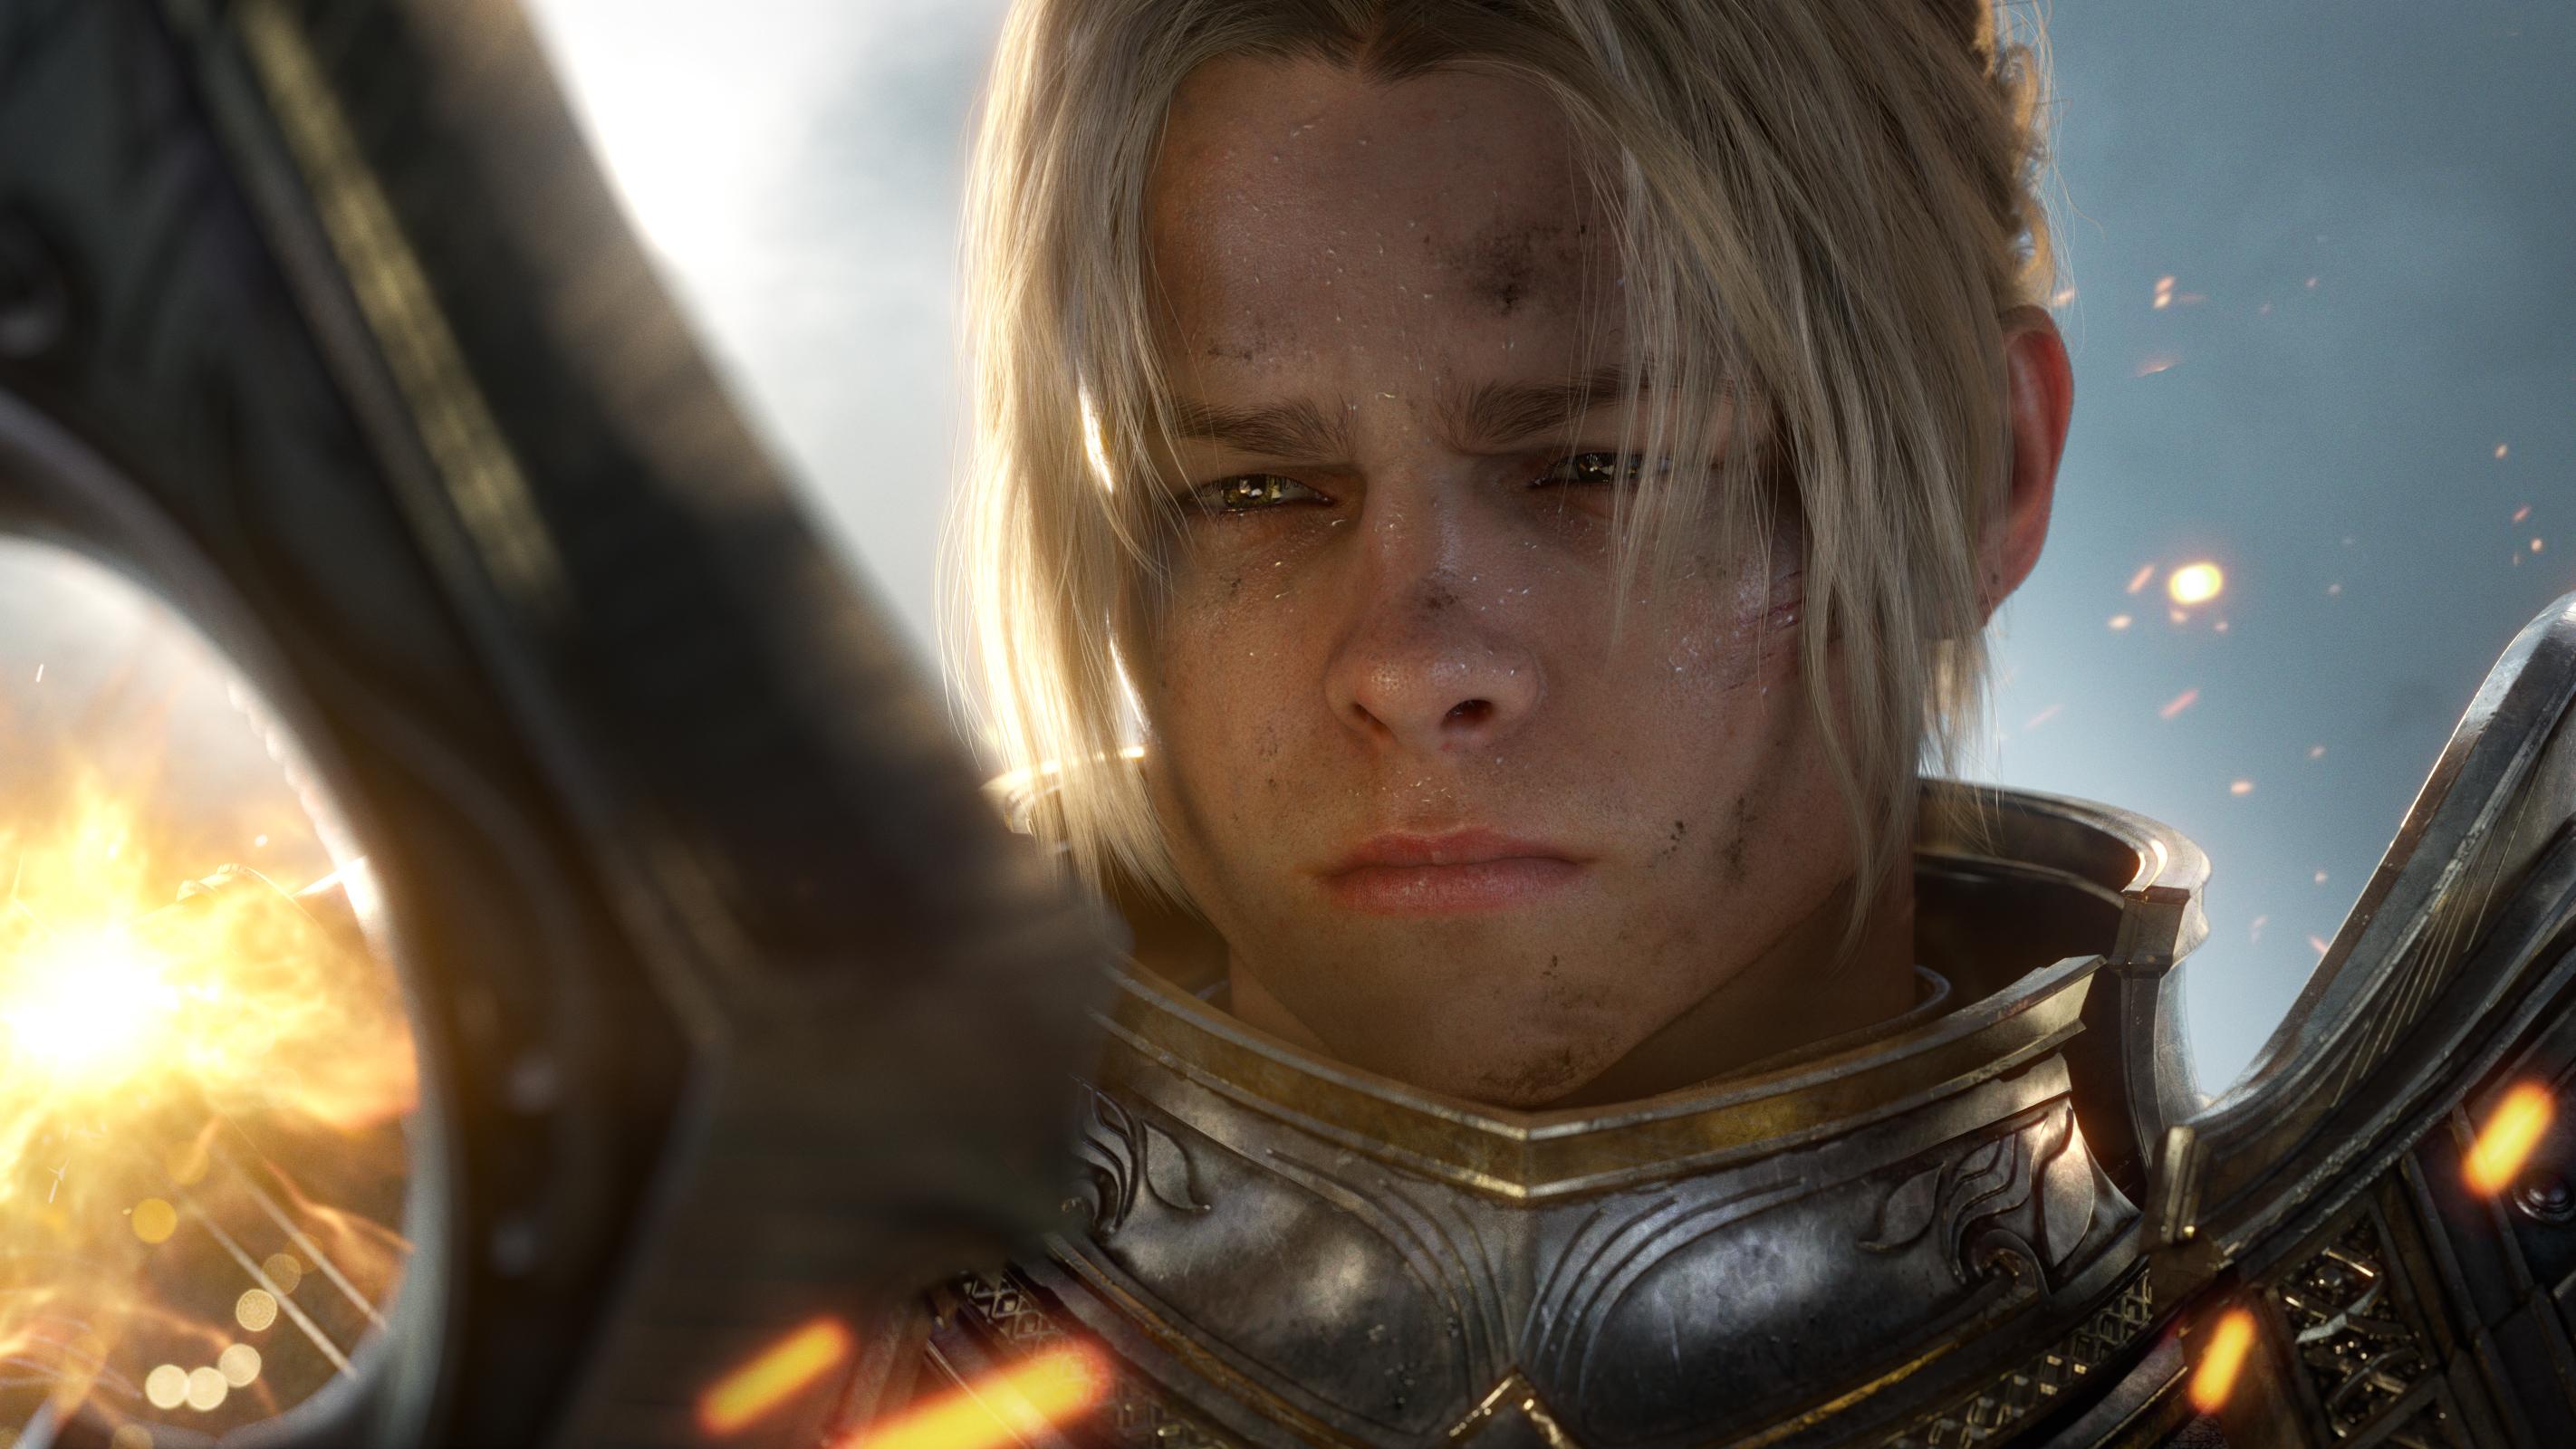 Wallpaper 4k World Of Warcraft Battle For Azeroth Azeroth